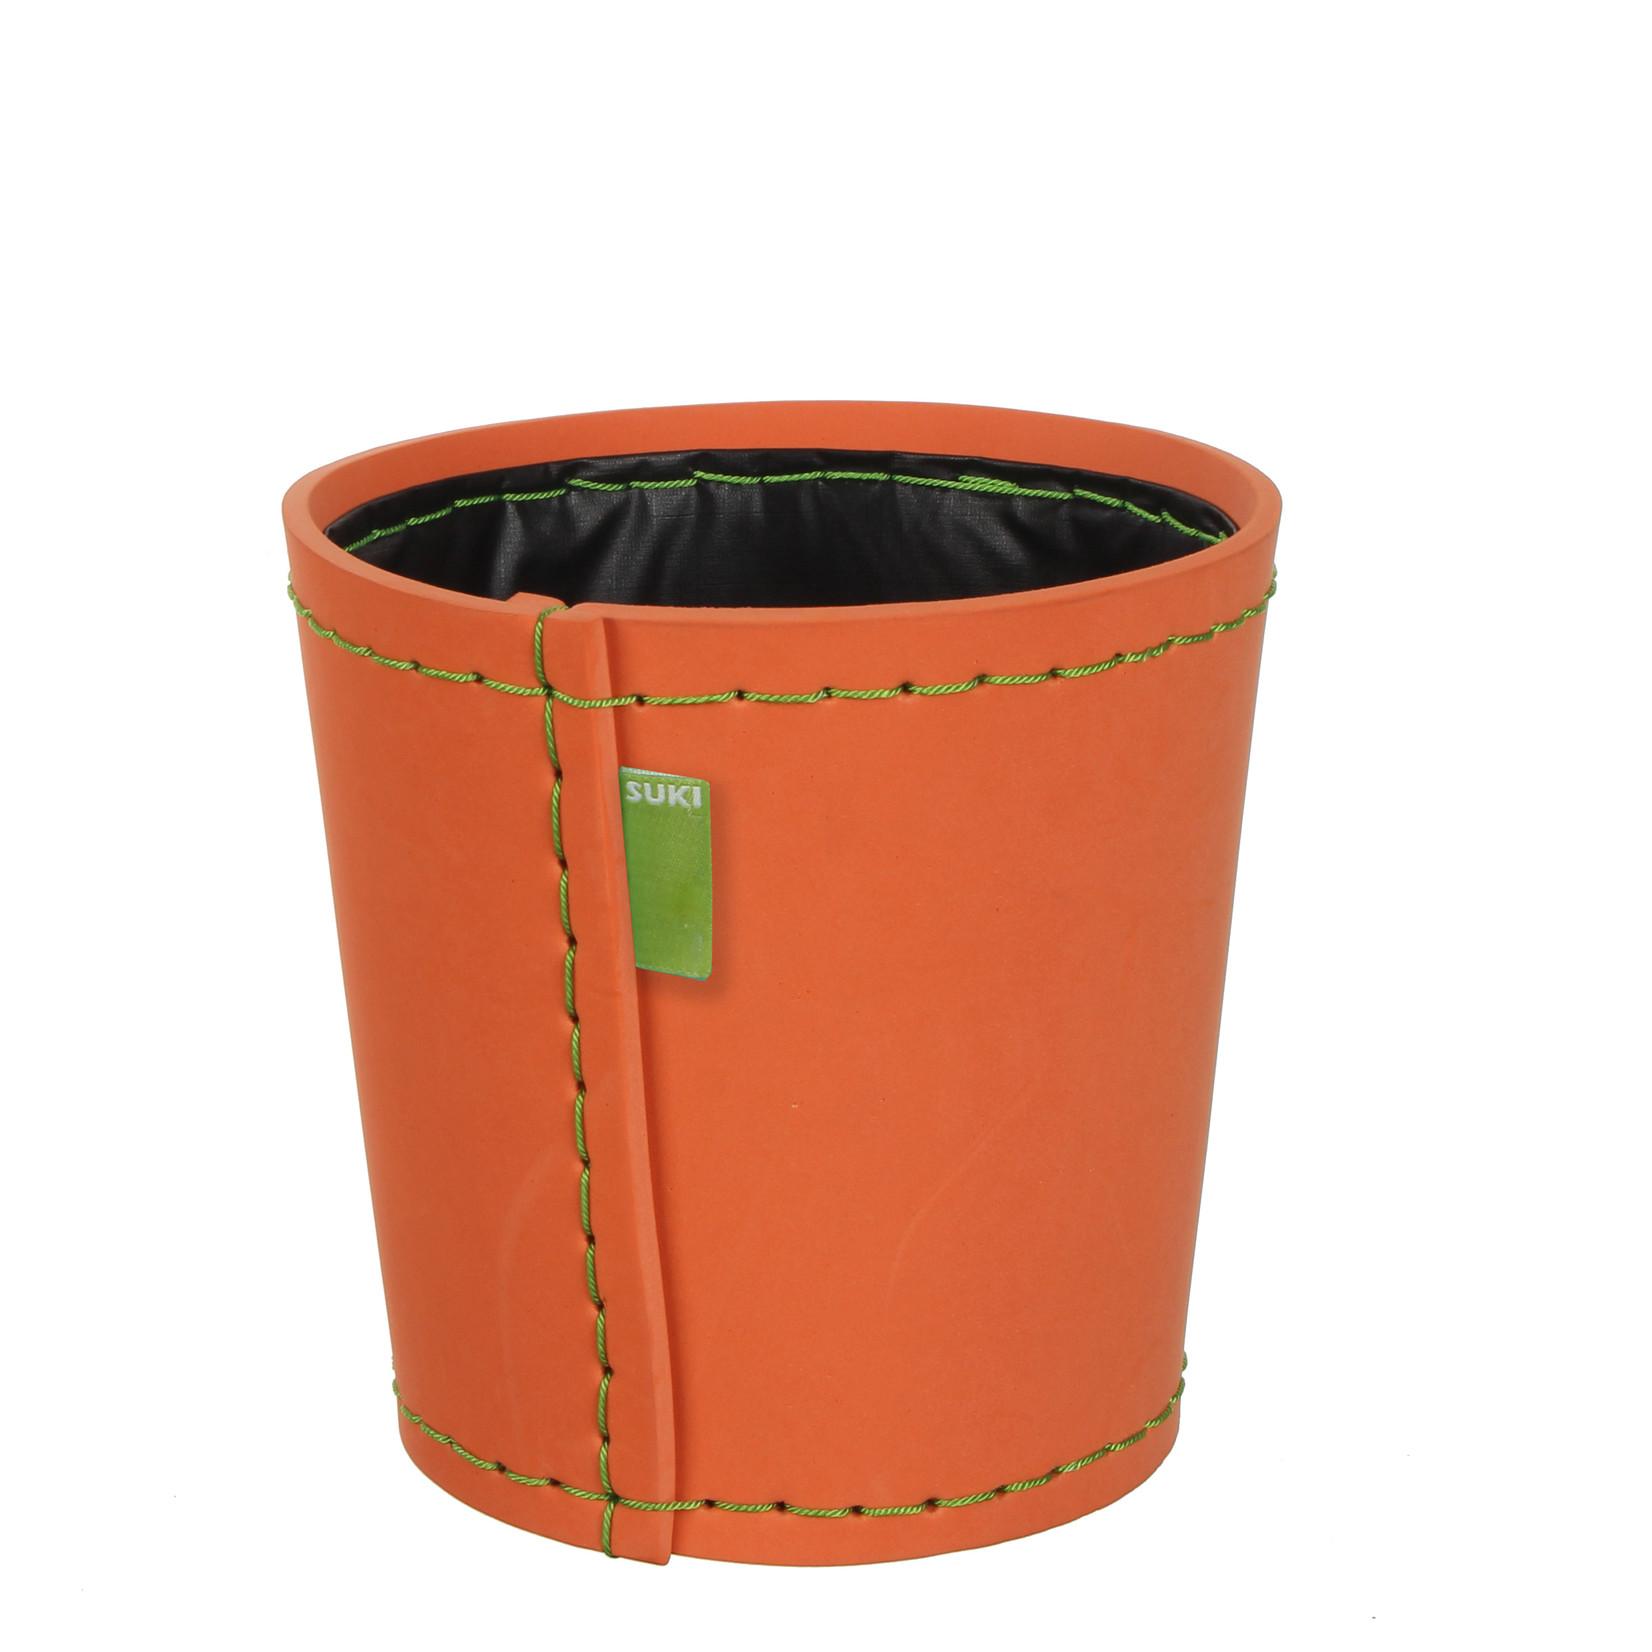 MiCa 153463 Pot rond Suki oranje